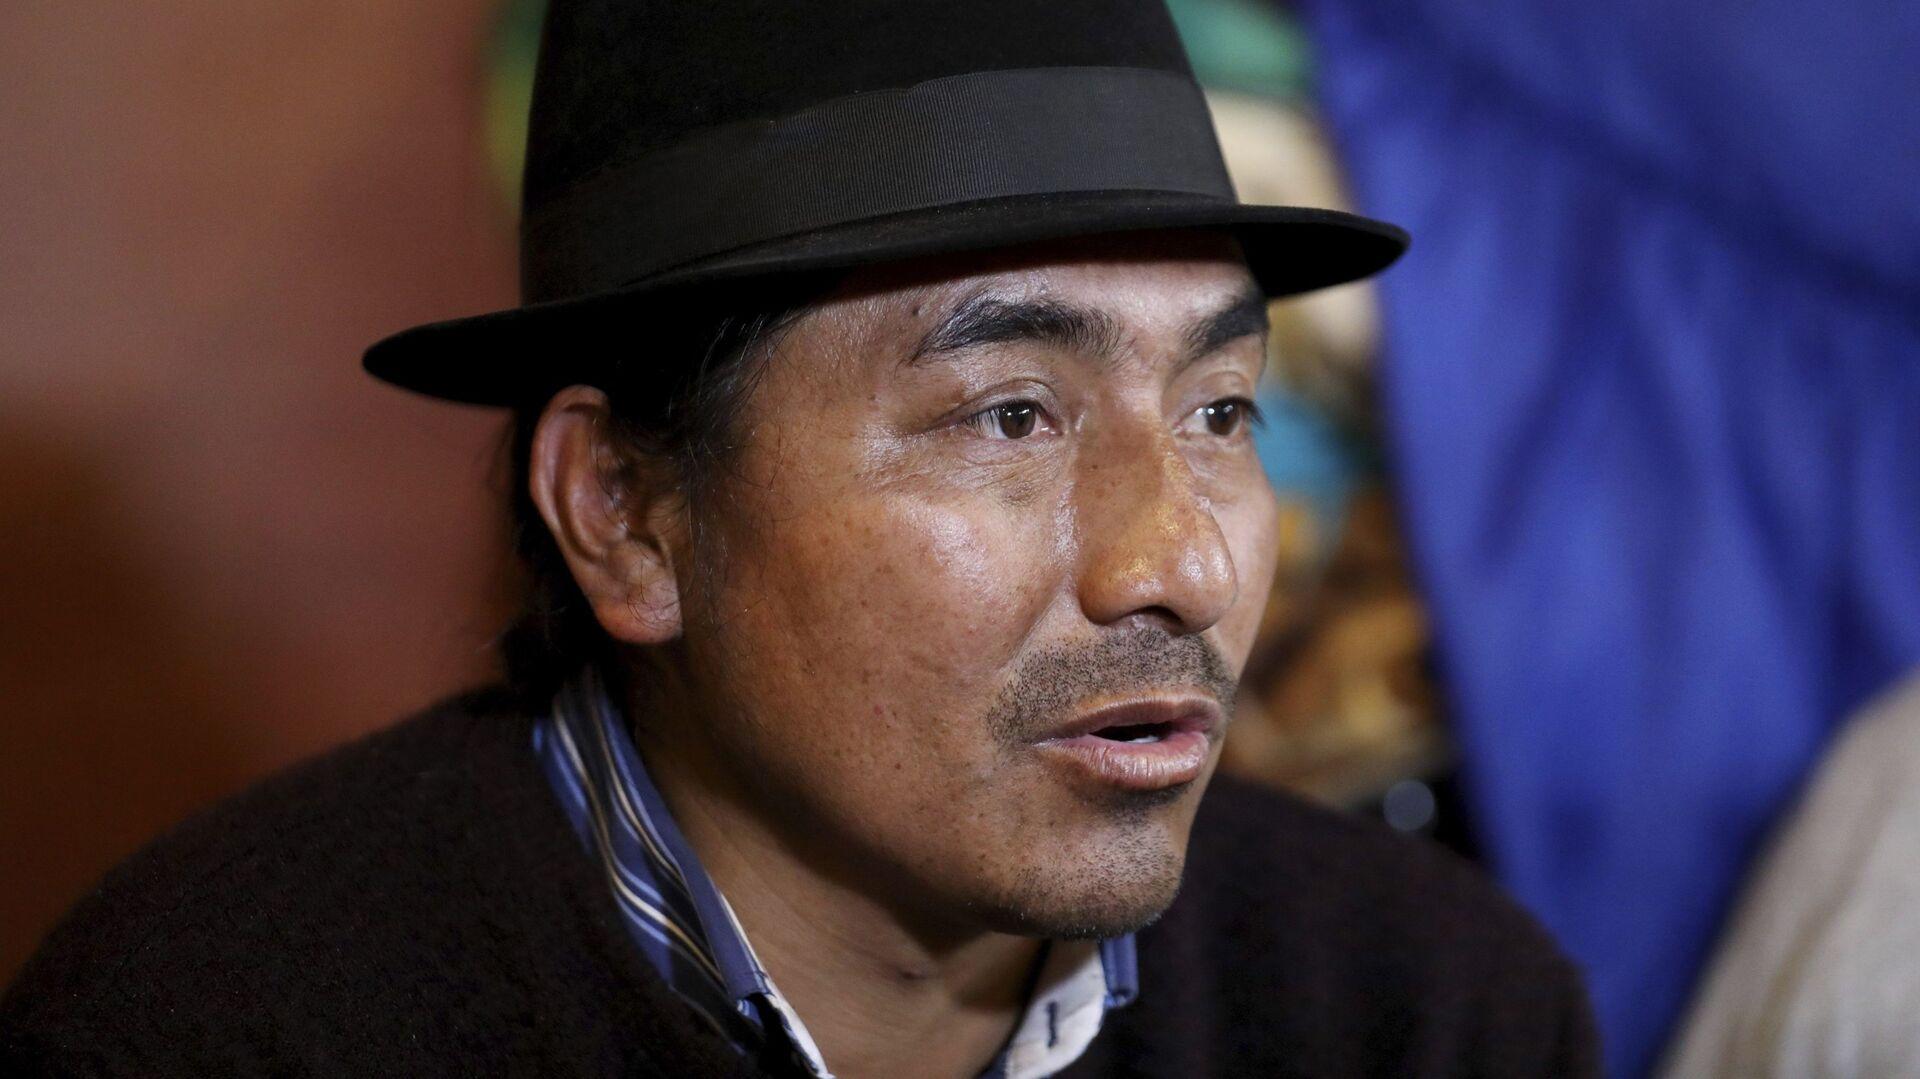 Leonidas Iza, dirigente indígena de Ecuador - Sputnik Mundo, 1920, 06.07.2021